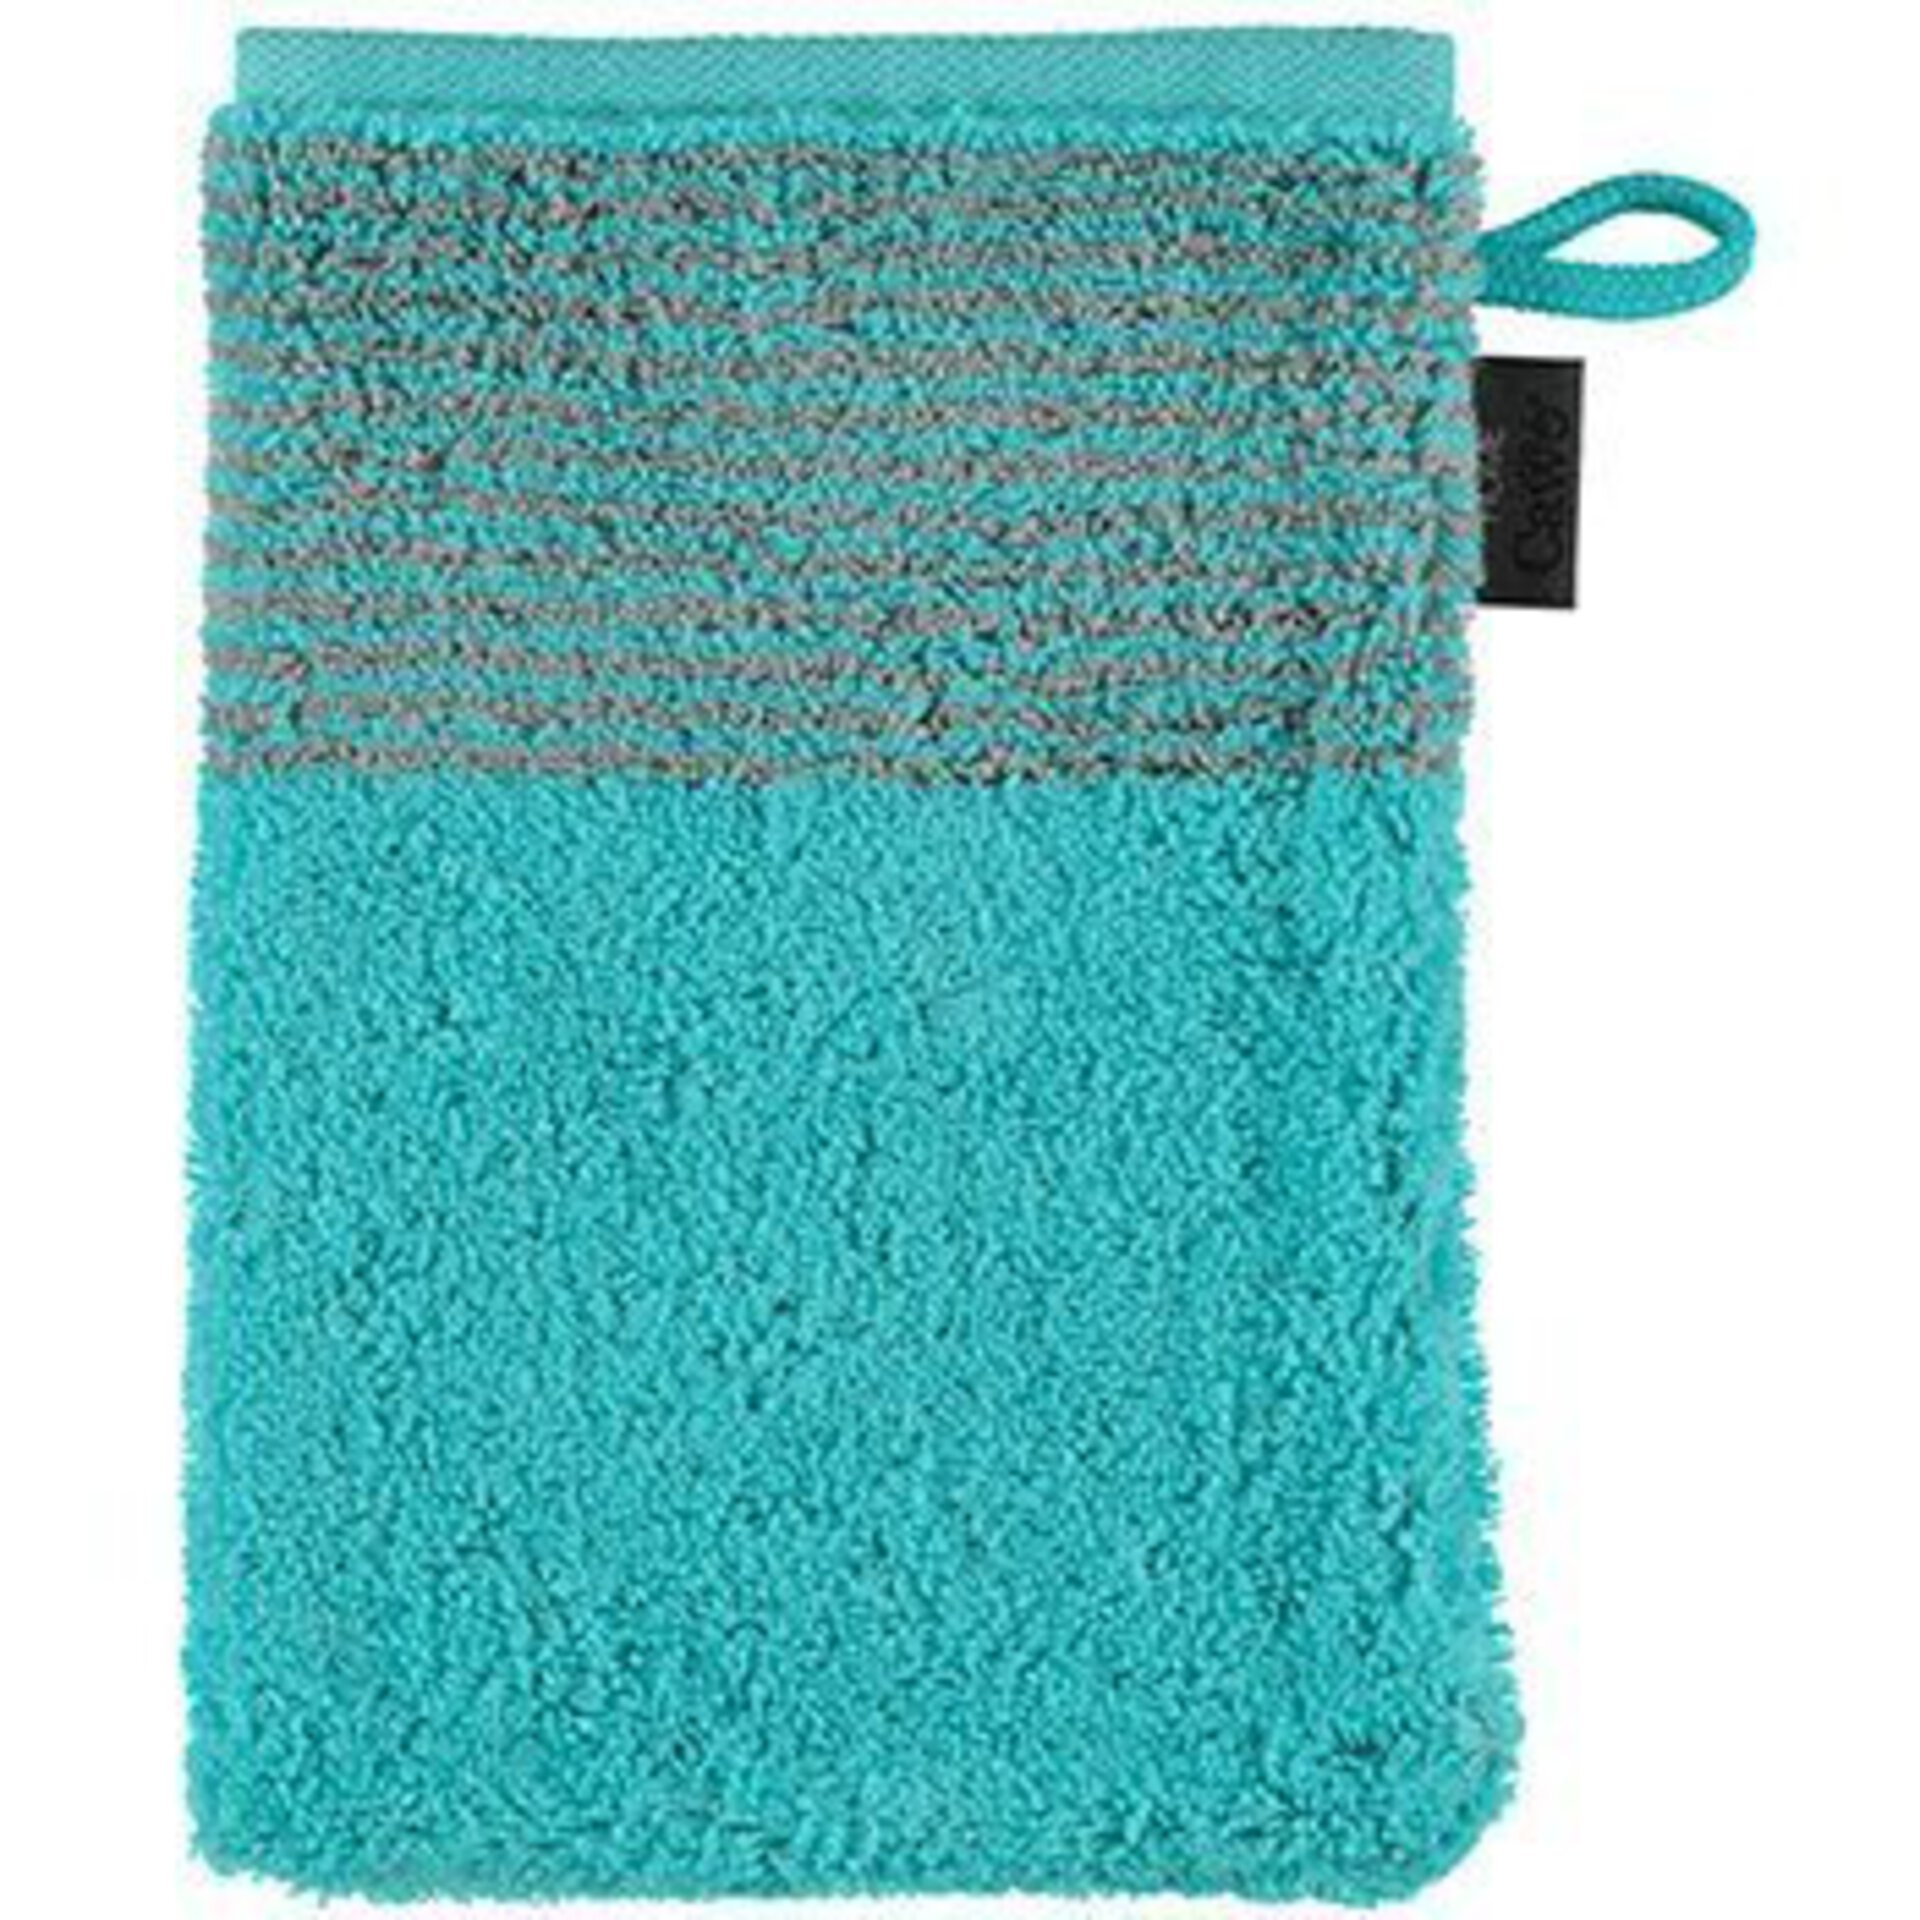 Waschhandschuh Two-Tone Cawö Textil 16 cm